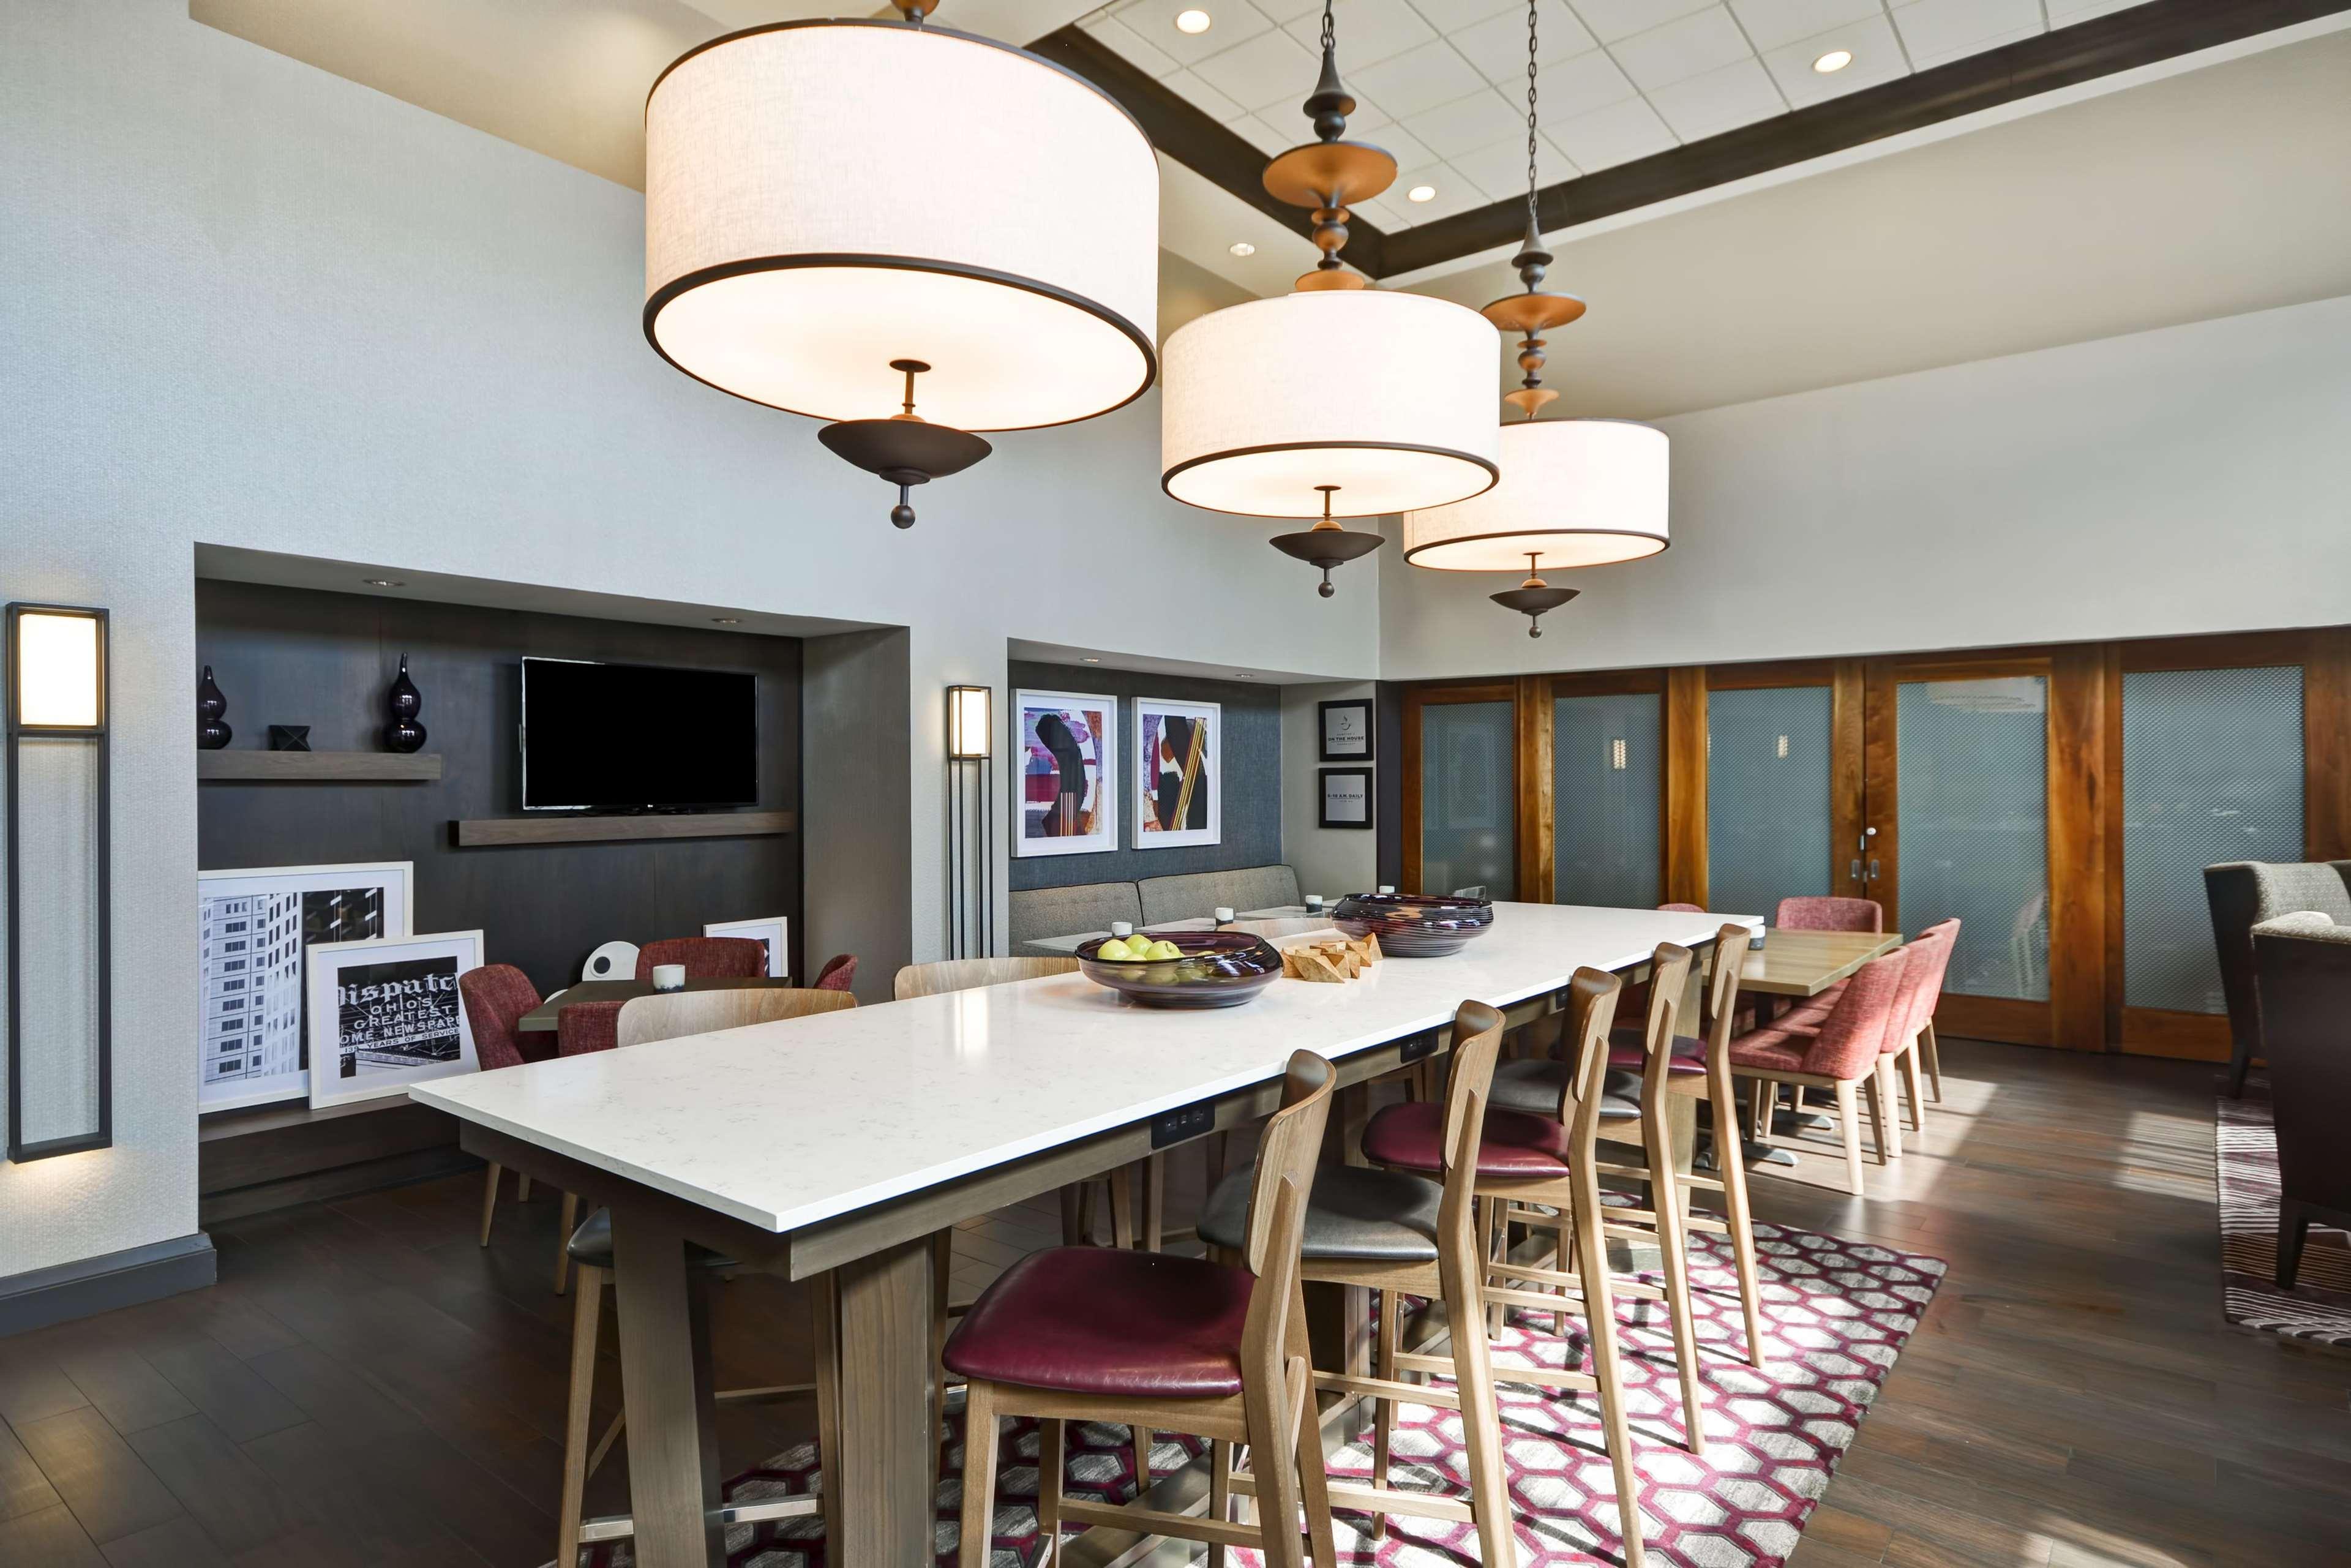 Hampton Inn & Suites Columbus-Easton Area image 8